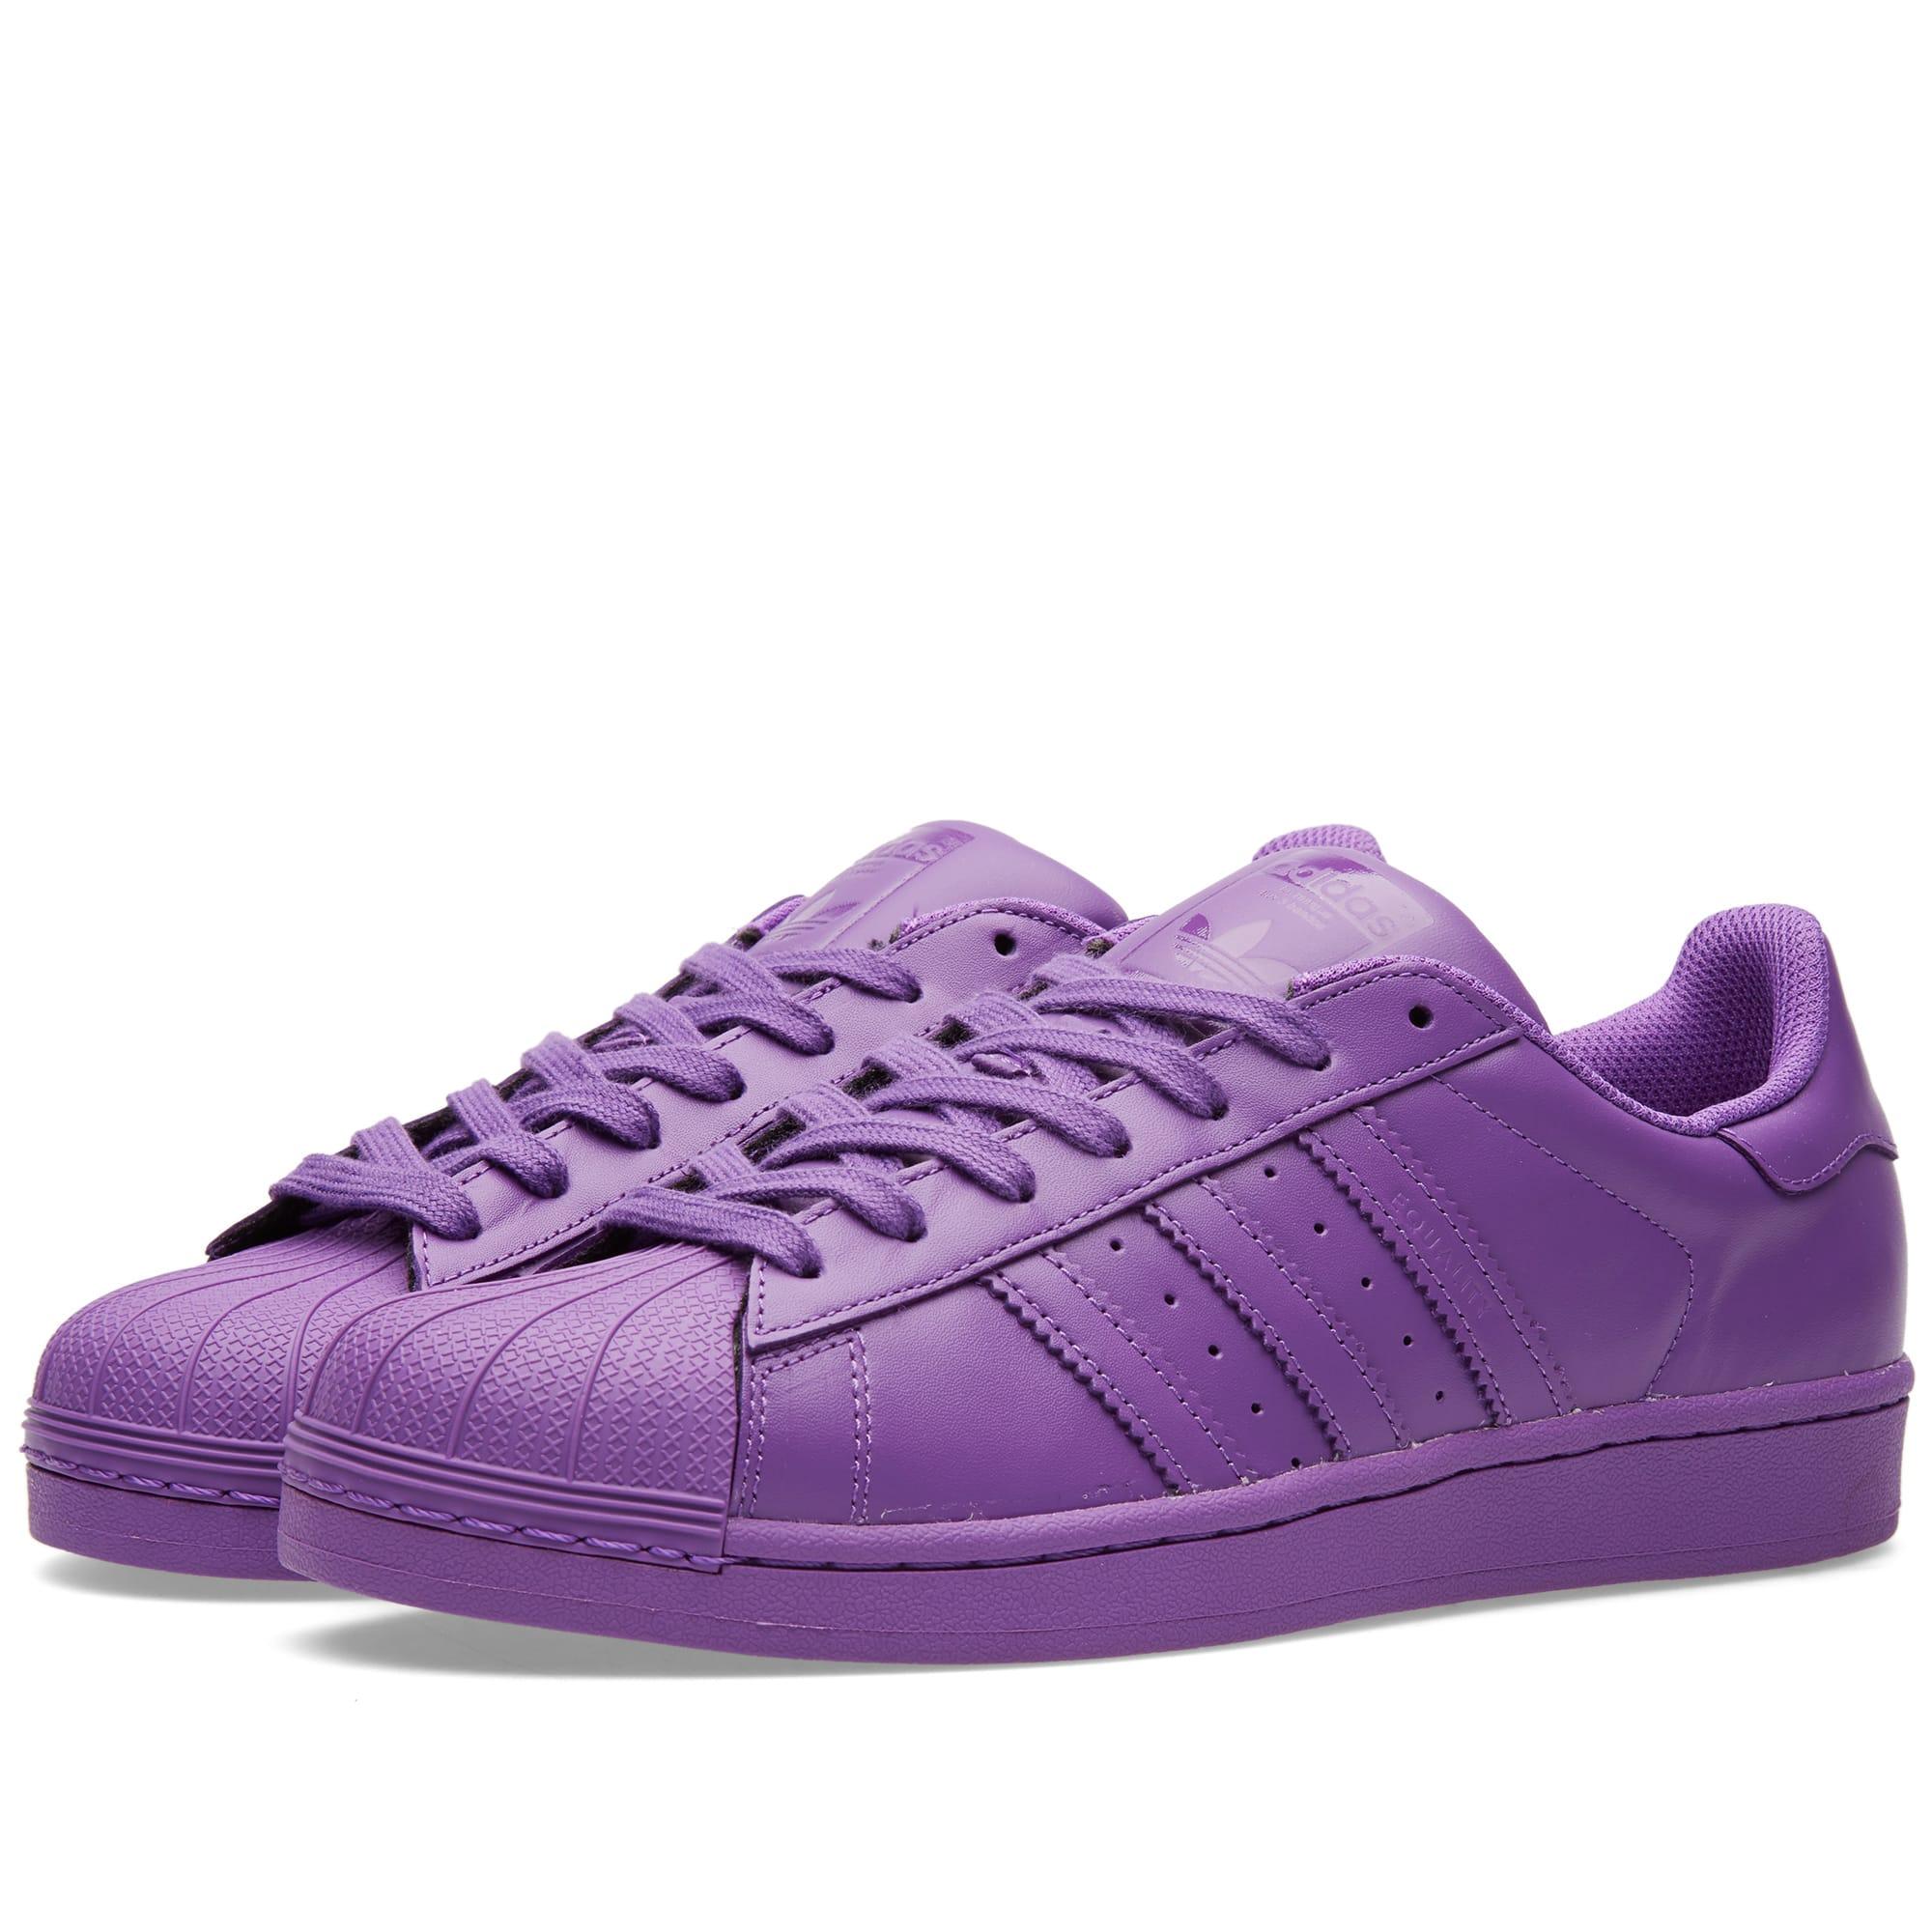 387b3a273b Adidas x Pharrell Superstar 'Supercolour' Ray Purple | END.